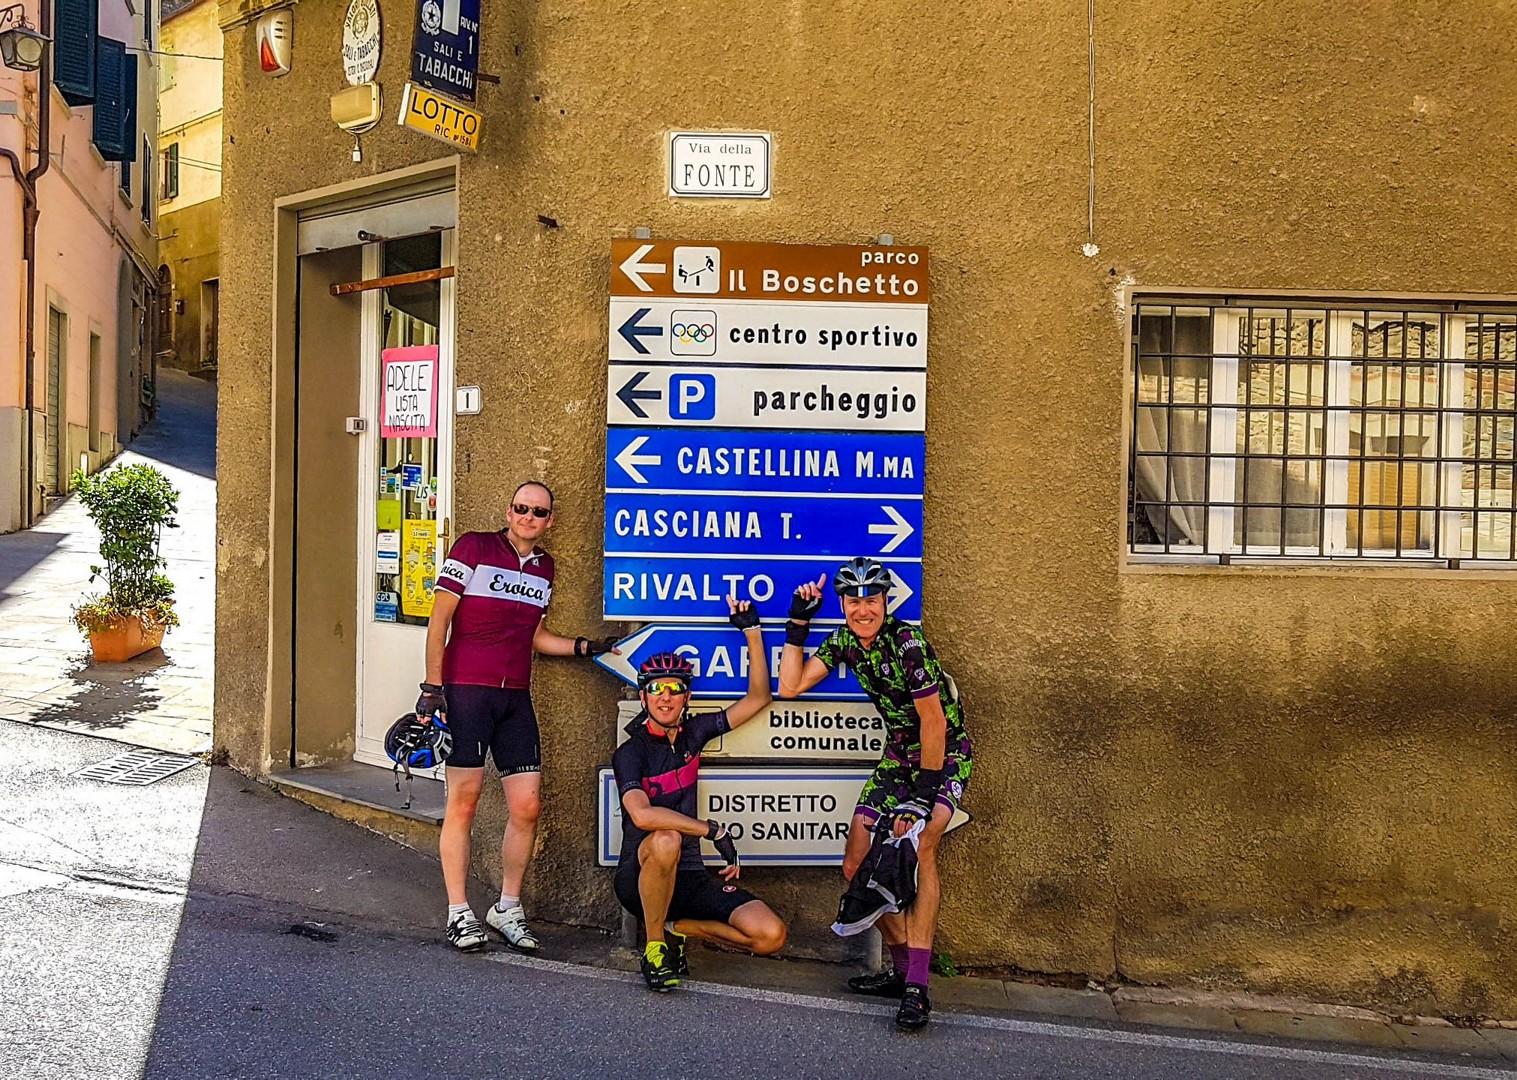 20170922_144954.jpg - Italy - Tuscany - Giro della Toscana - Self-Guided Road Cycling Holiday - Road Cycling